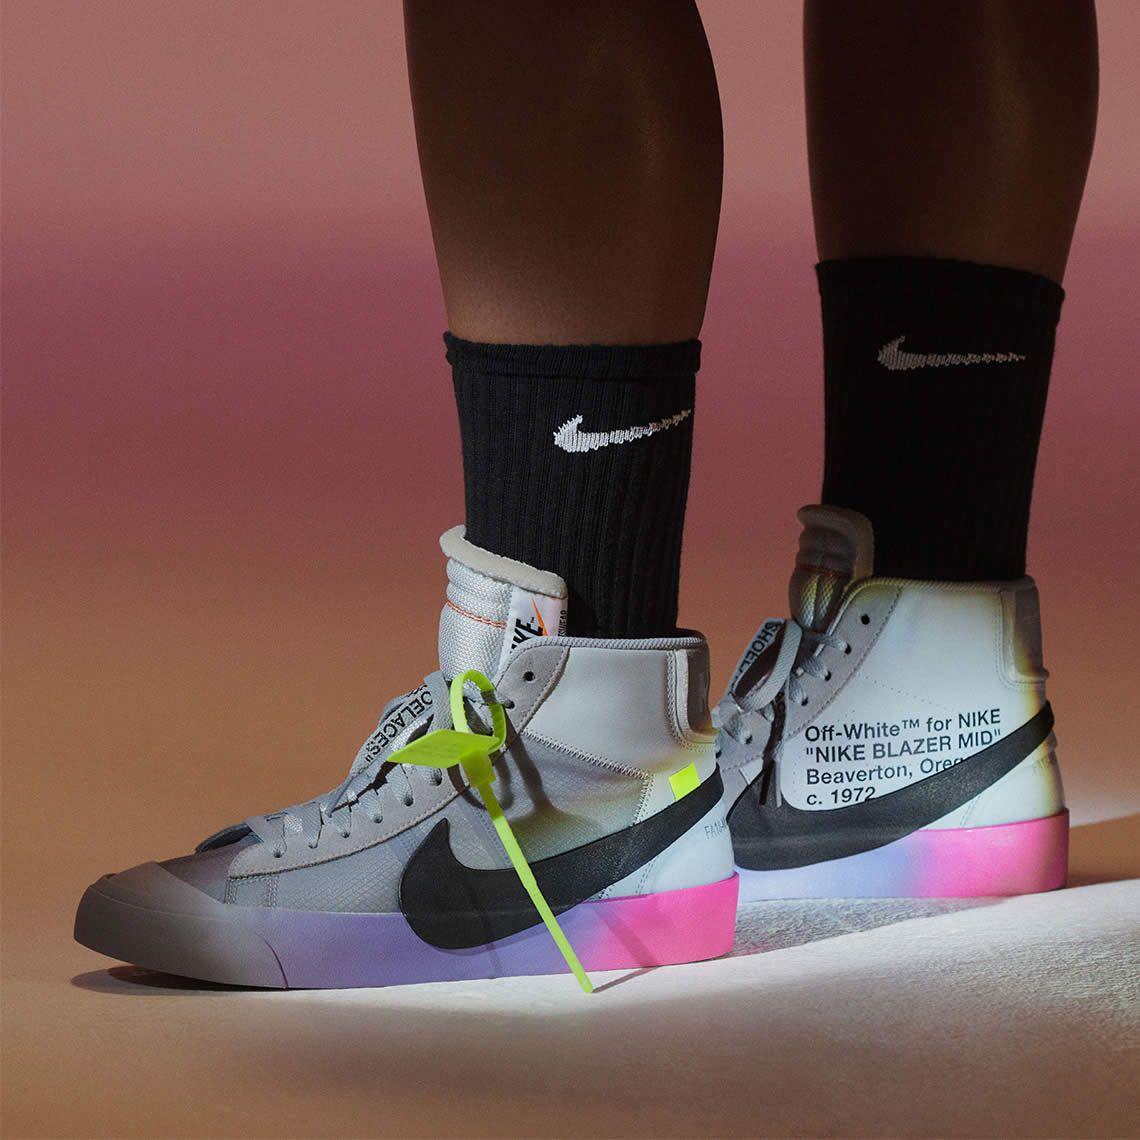 150282901e9a Serena Williams x OFF-WHITE x Nike Blazer Studio Mid  Queen  On Feet ...